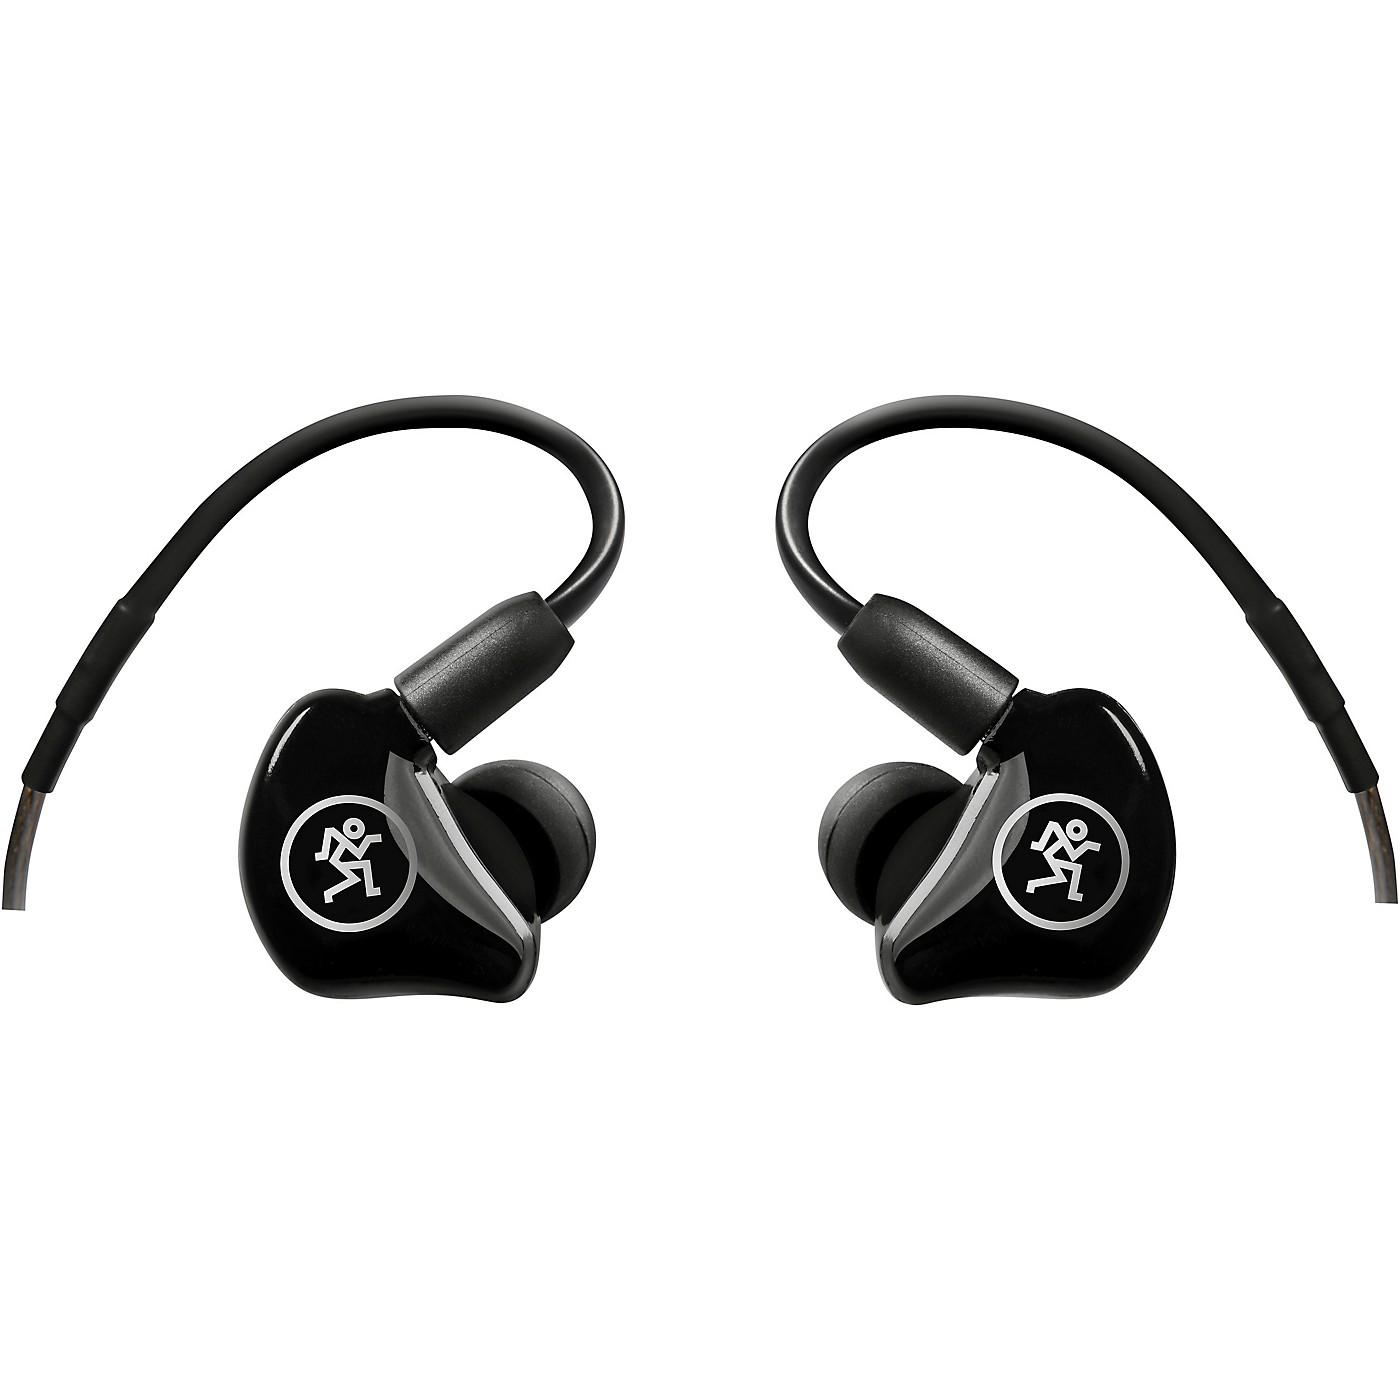 Mackie MP-240 Dual Hybrid Driver Professional In-Ear Monitors thumbnail